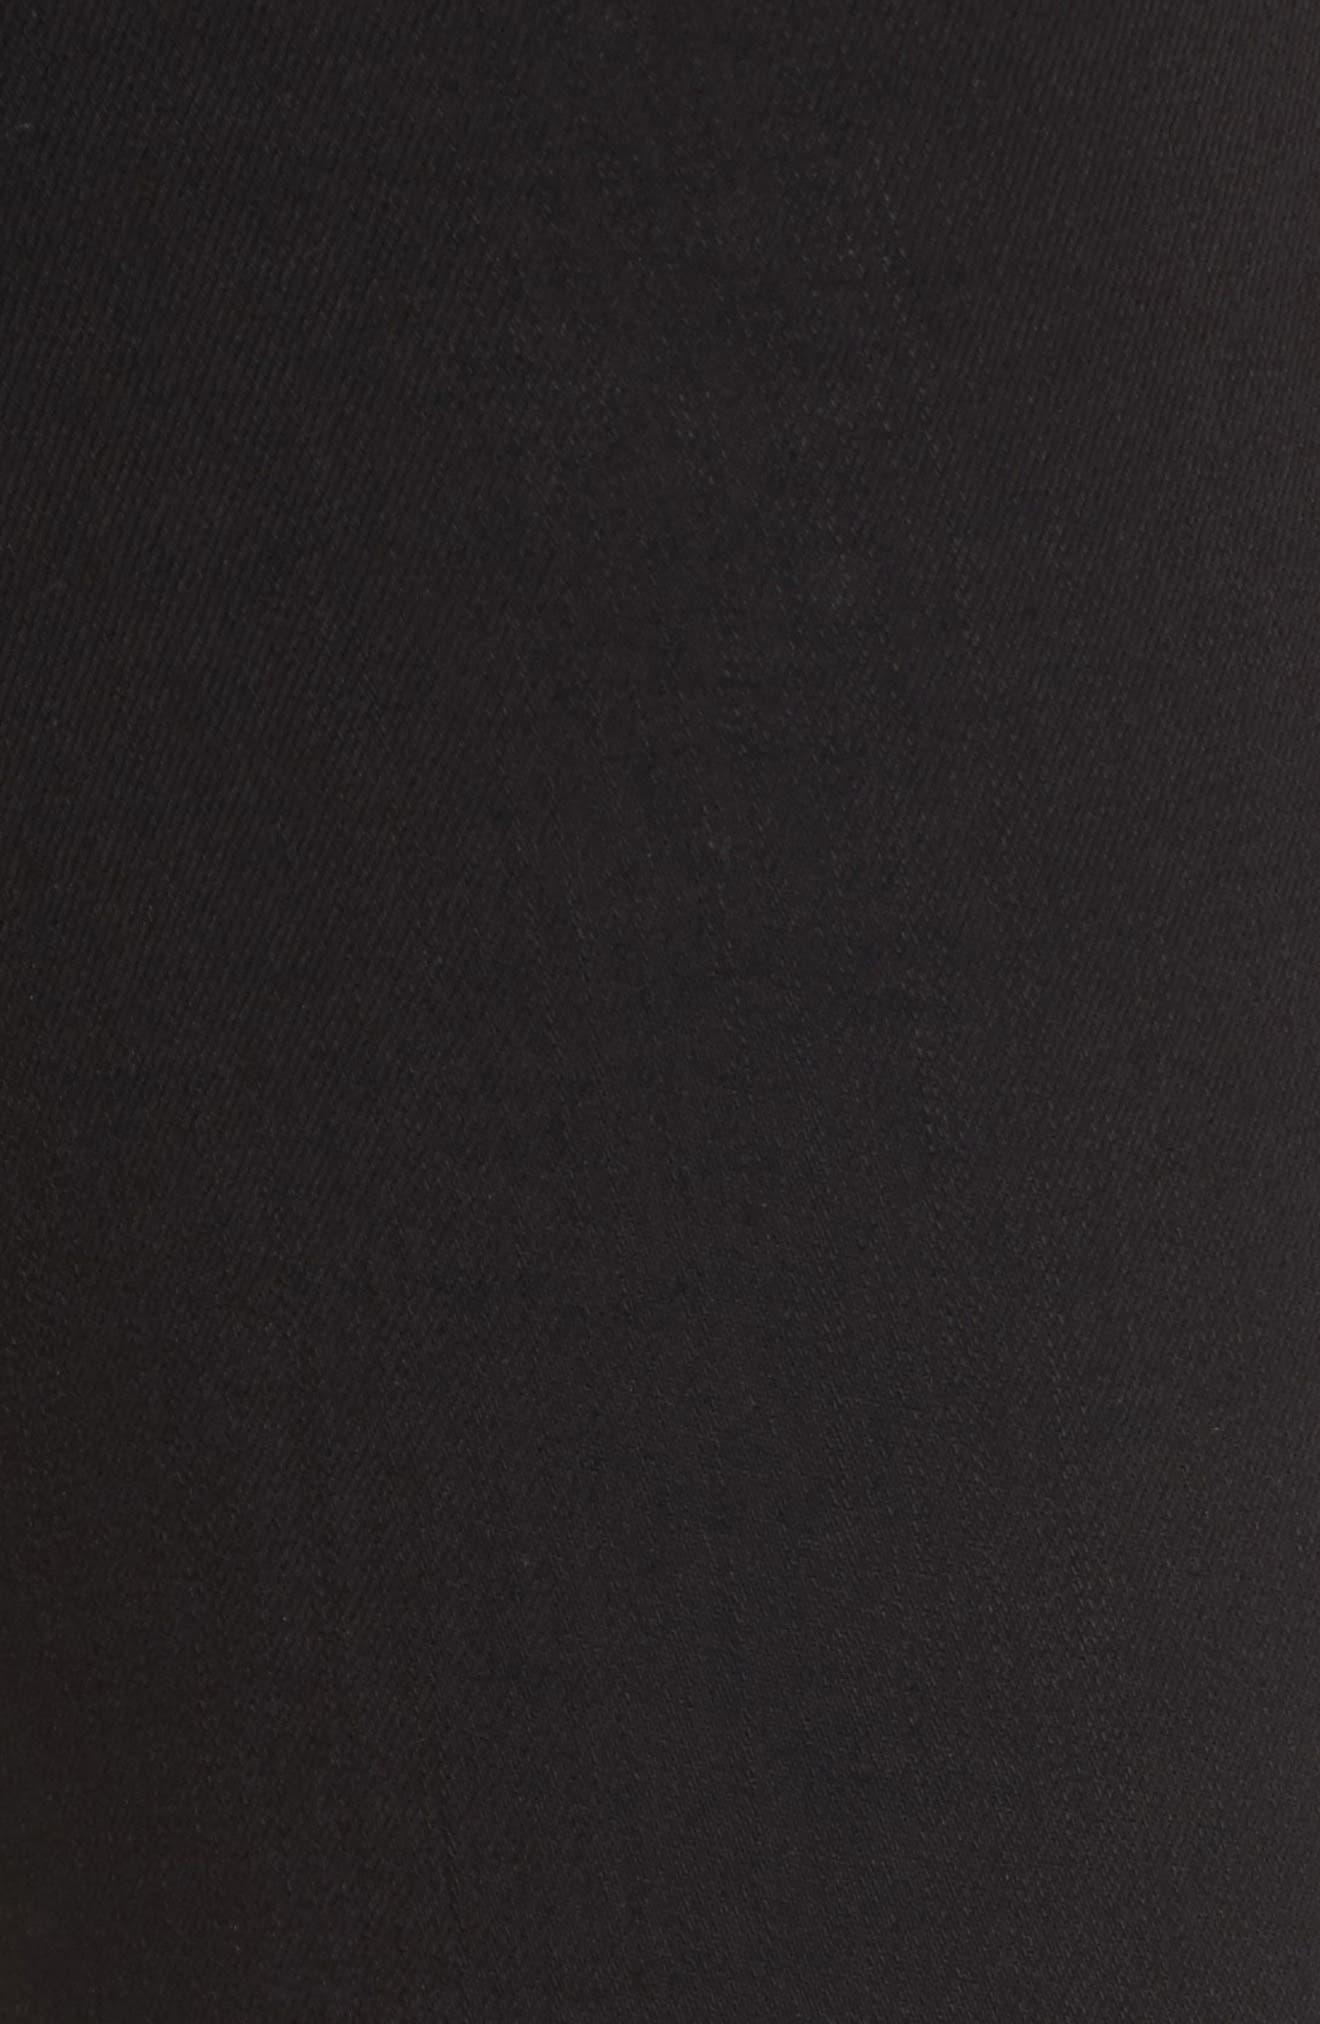 Luma High Waist Skinny Stirrup Jeans,                             Alternate thumbnail 5, color,                             002